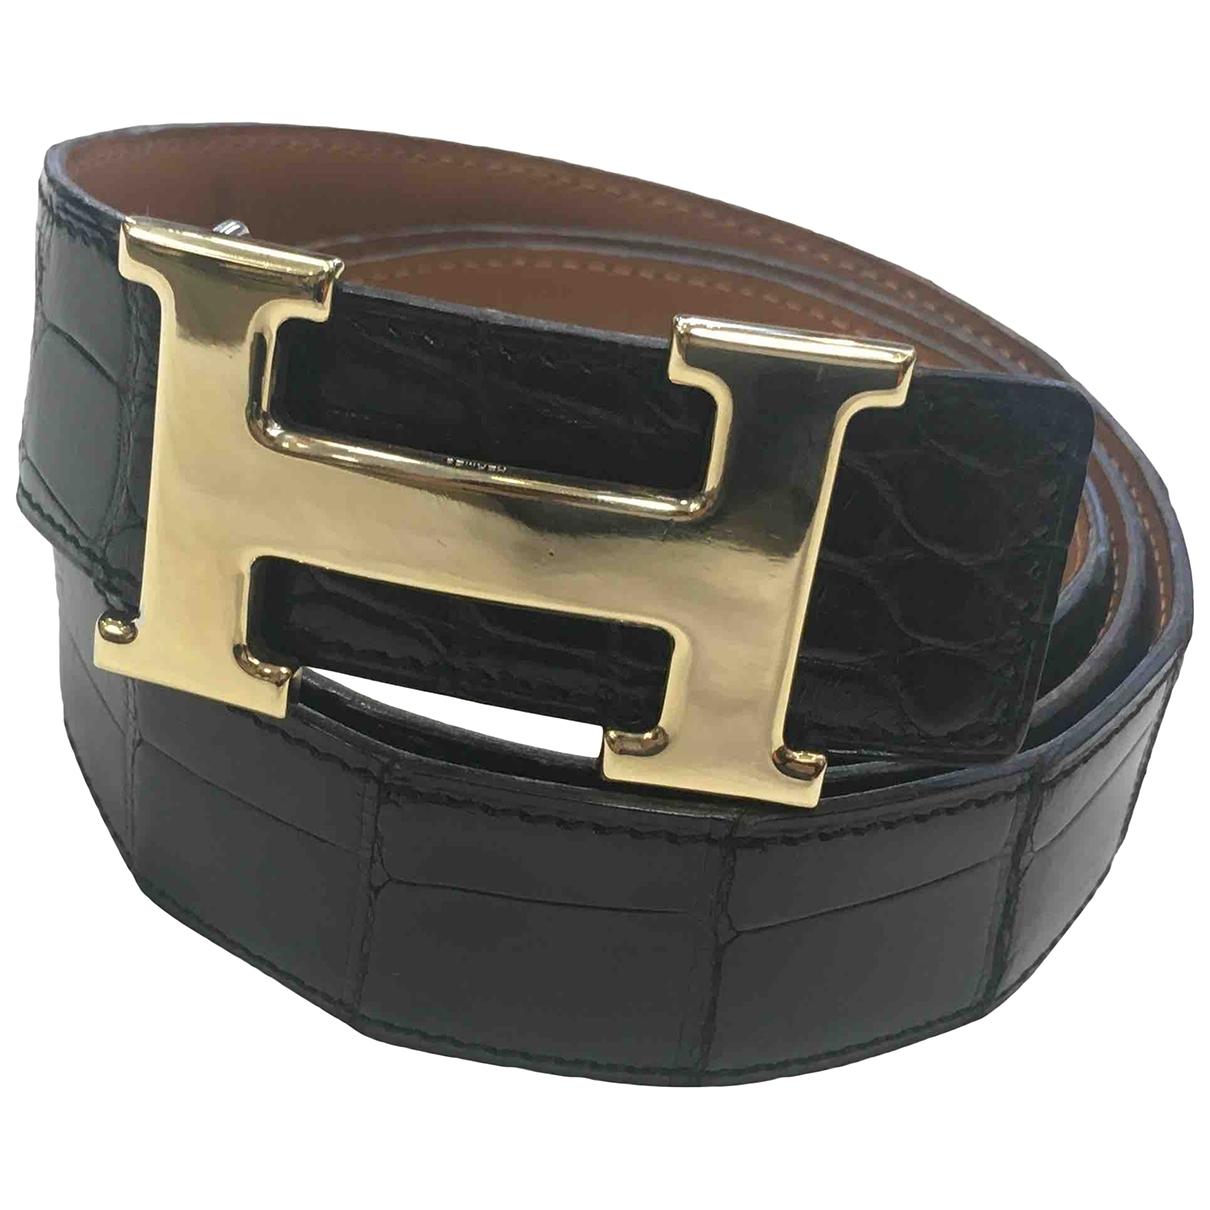 Cinturon H de Cocodrilo Hermes